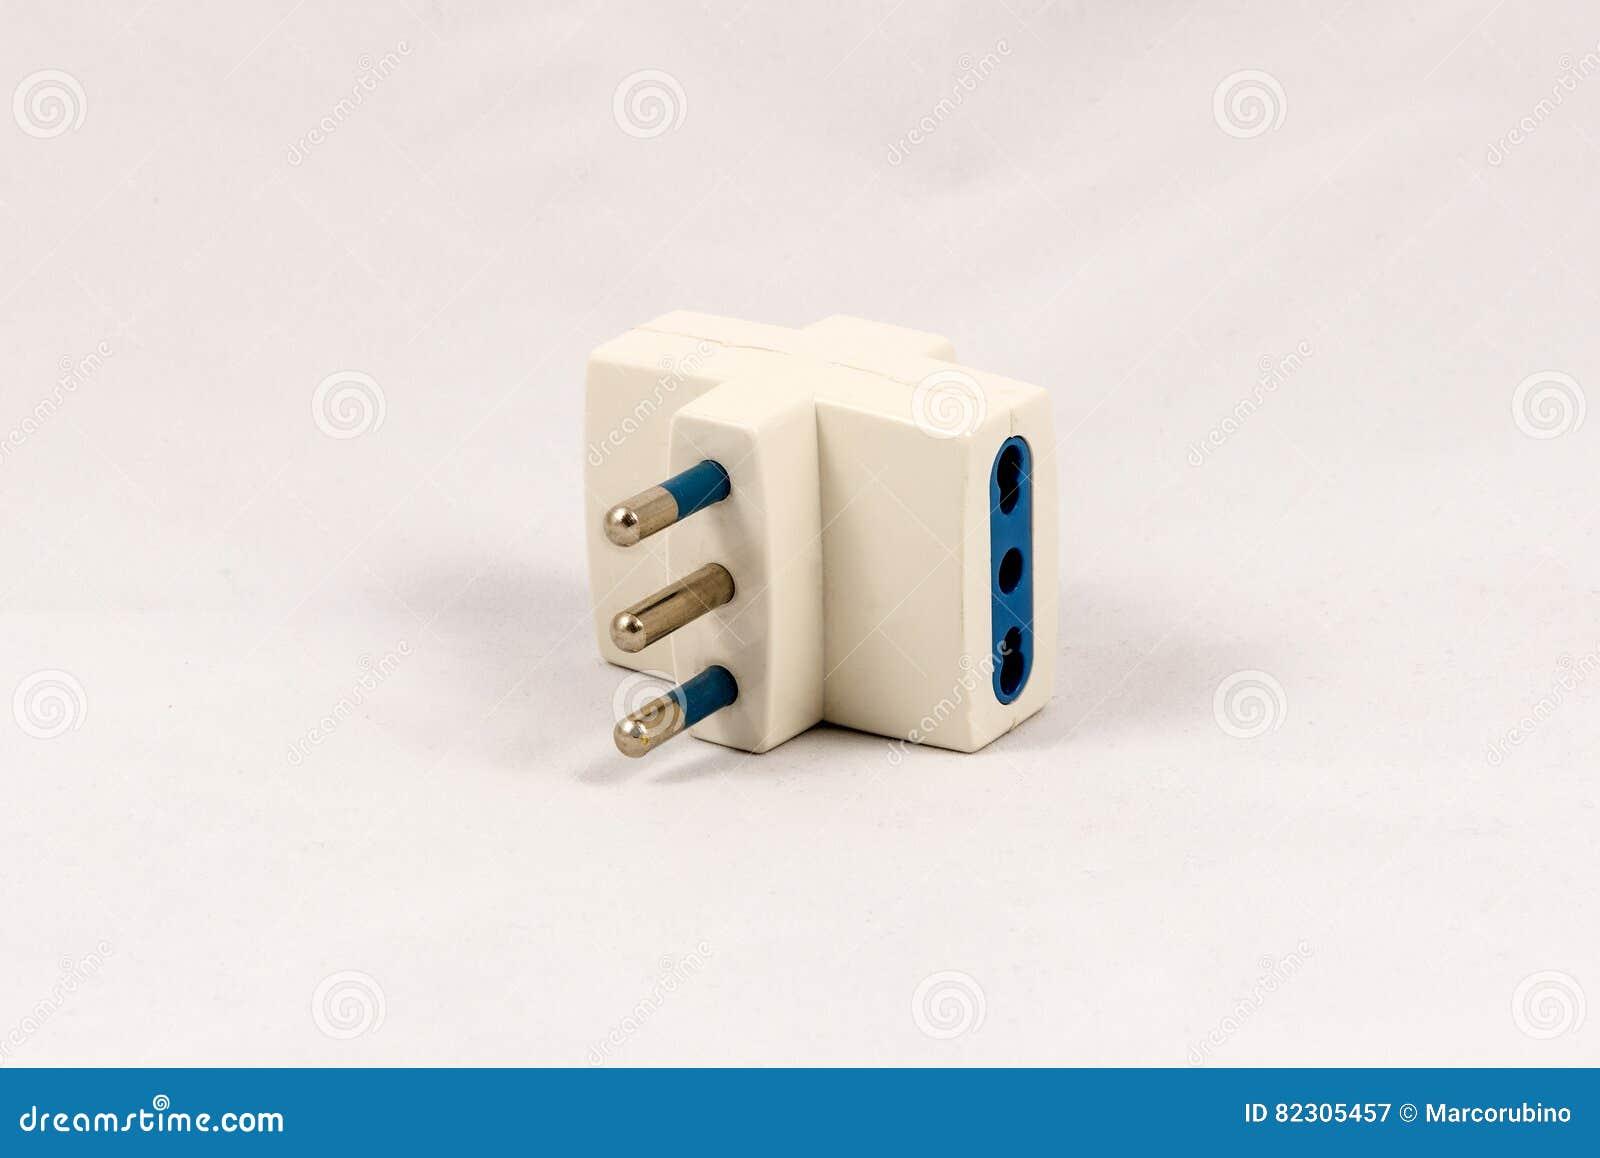 Three Way EU Electric Plug Adaptor Stock Image - Image of pins ...